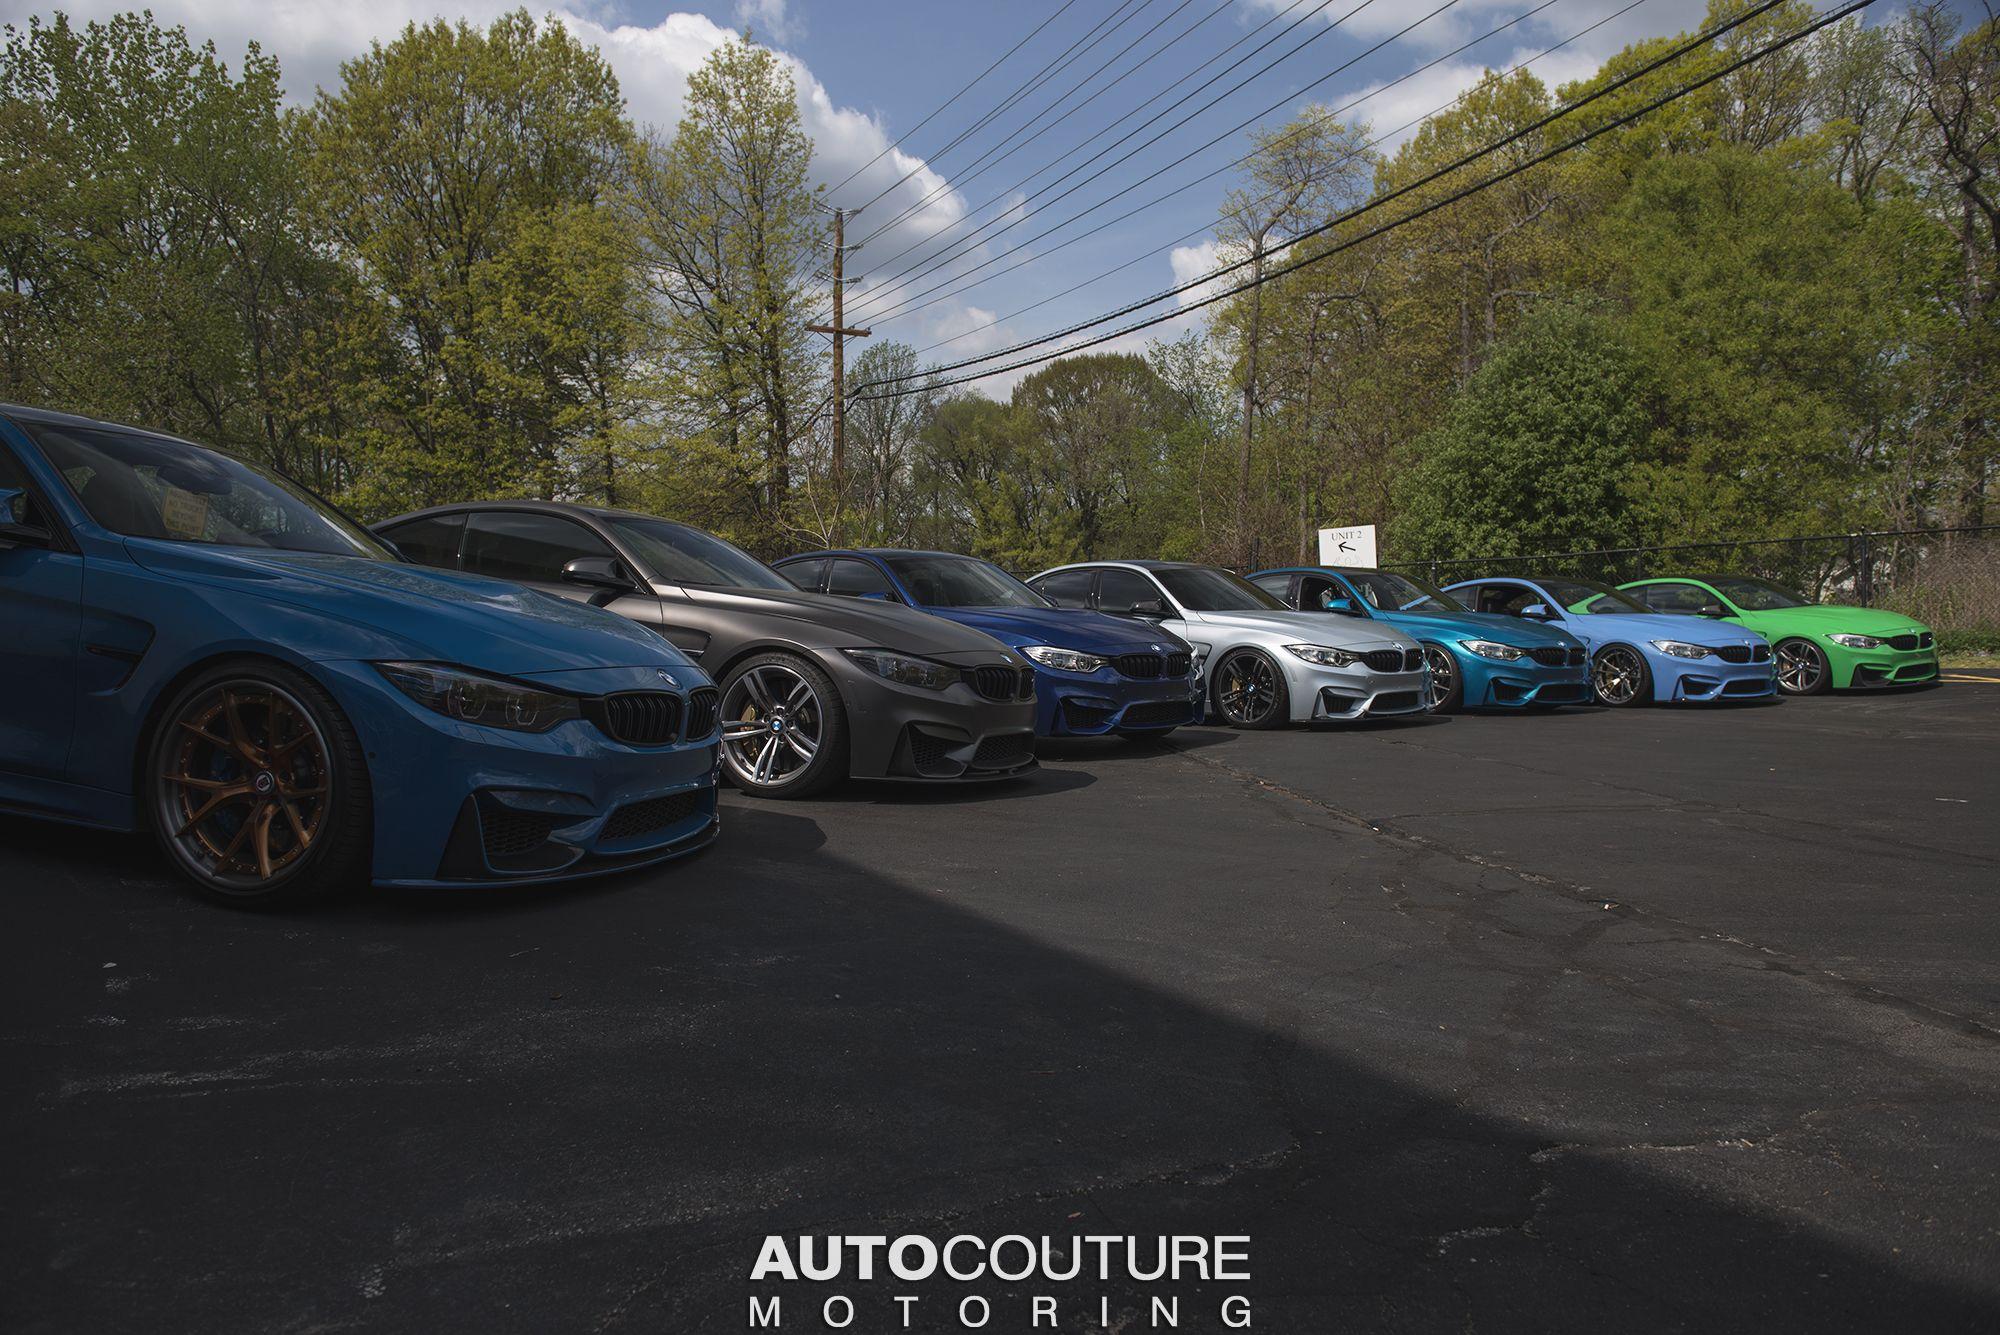 BMW F80 M3 Sedan F82 M4 Coupe F83 M4 Convertible GTS